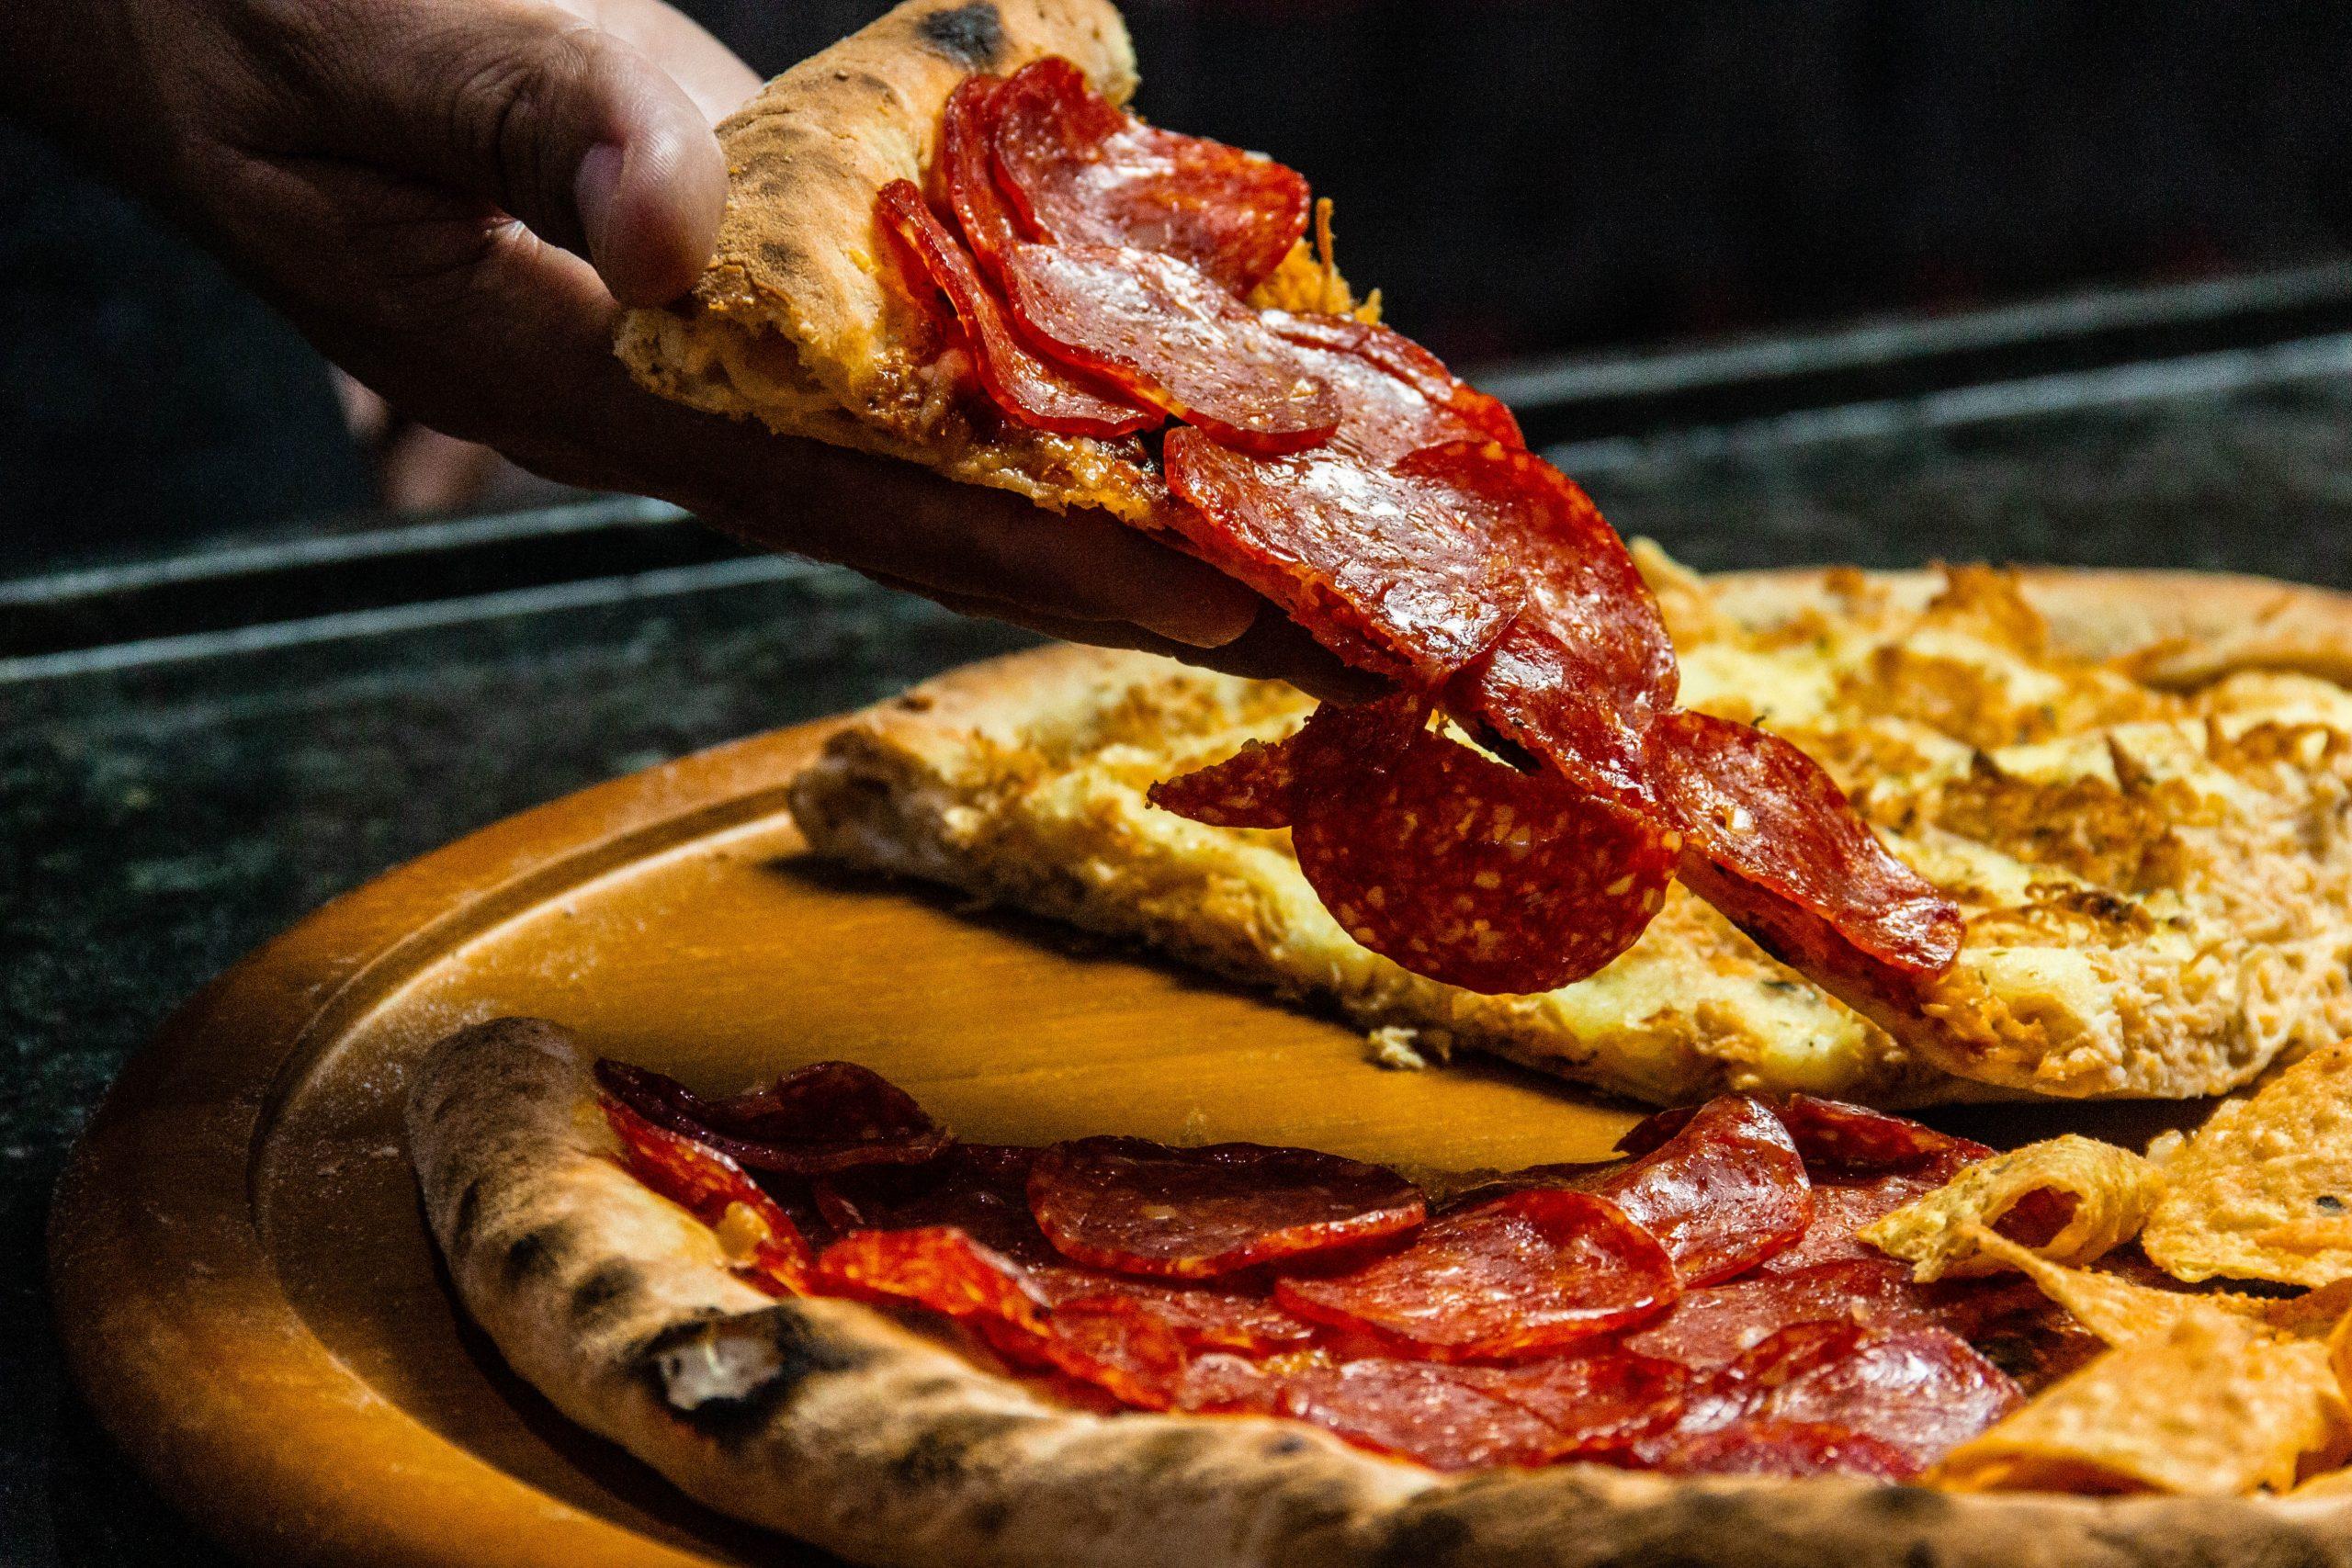 Rebanada de pizza pepperoni